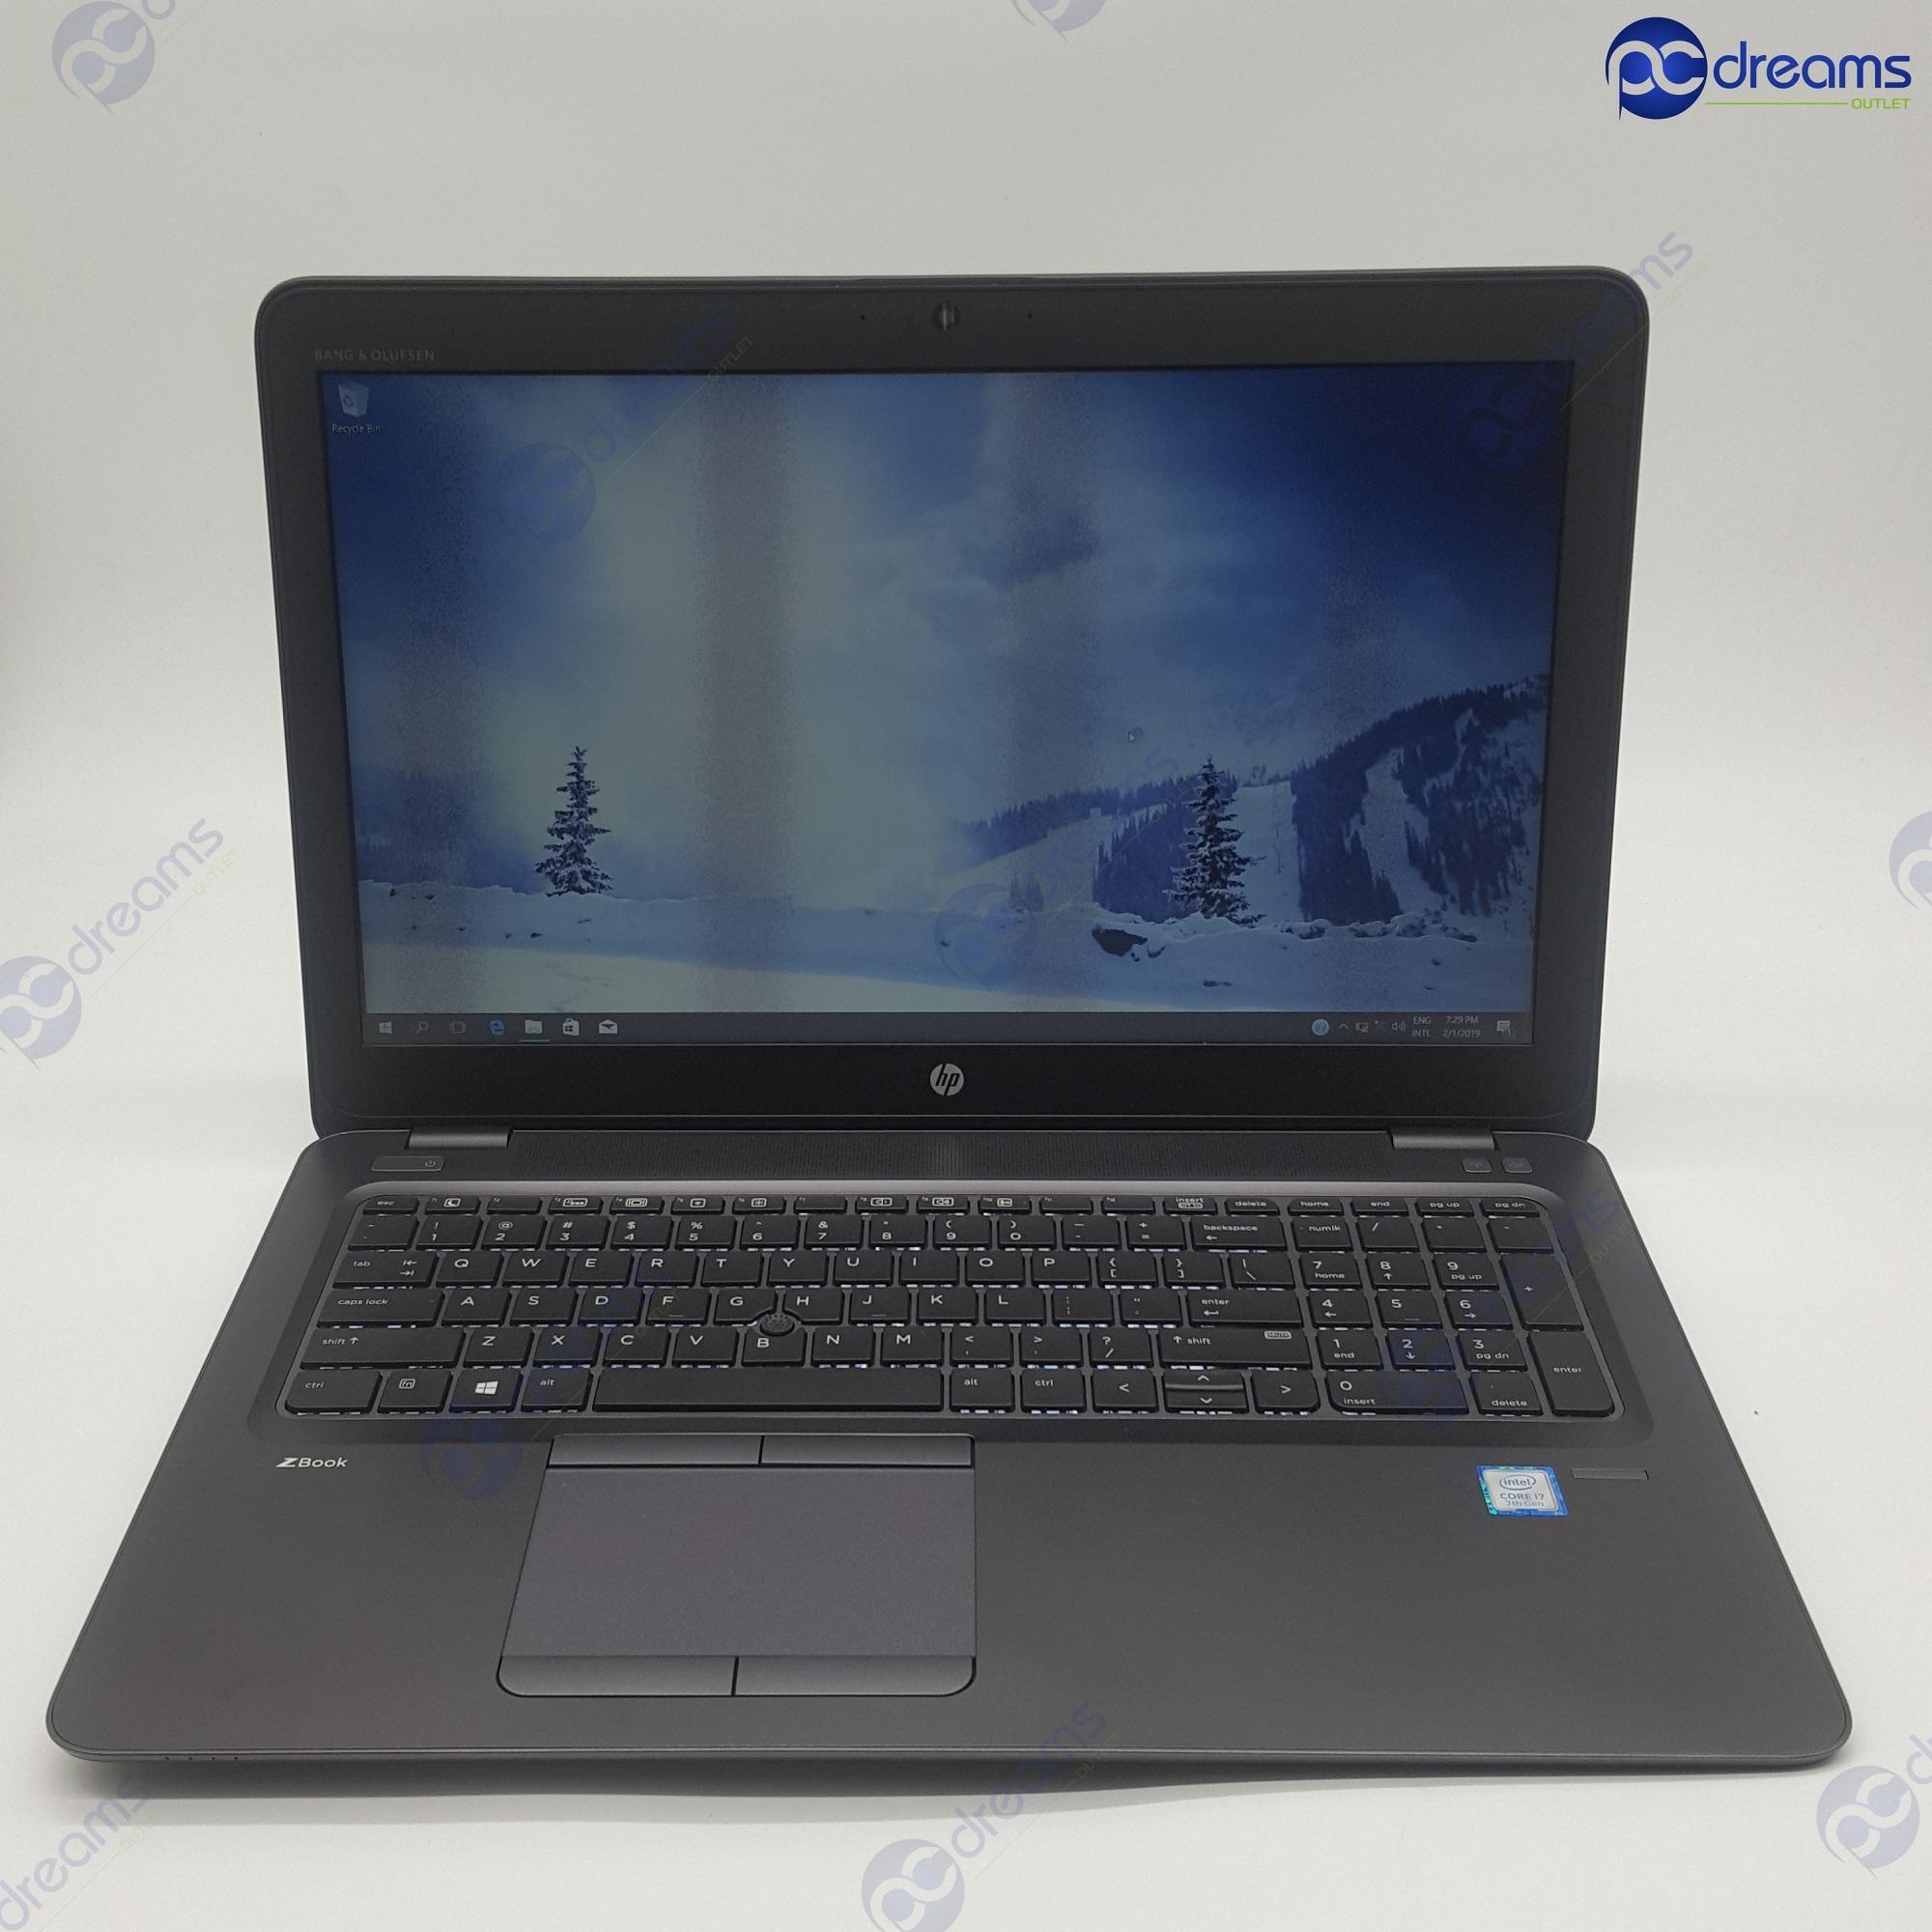 HP ZBOOK 15U G4 (2HU09AV) i7-7600U/16GB/256GB SSD [Premium Refreshed]